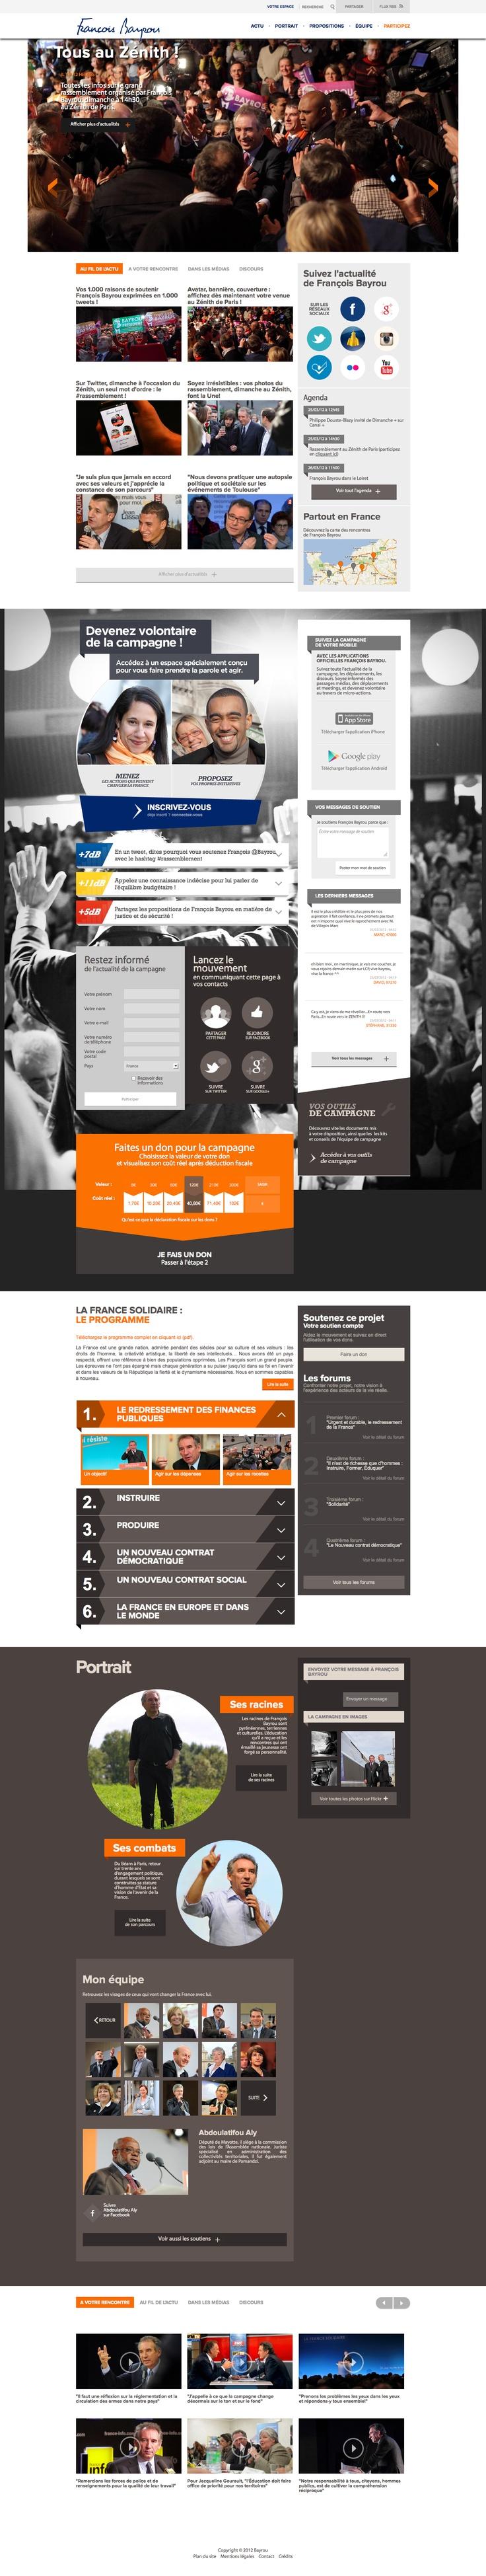 Francois Bayrou's campaign website